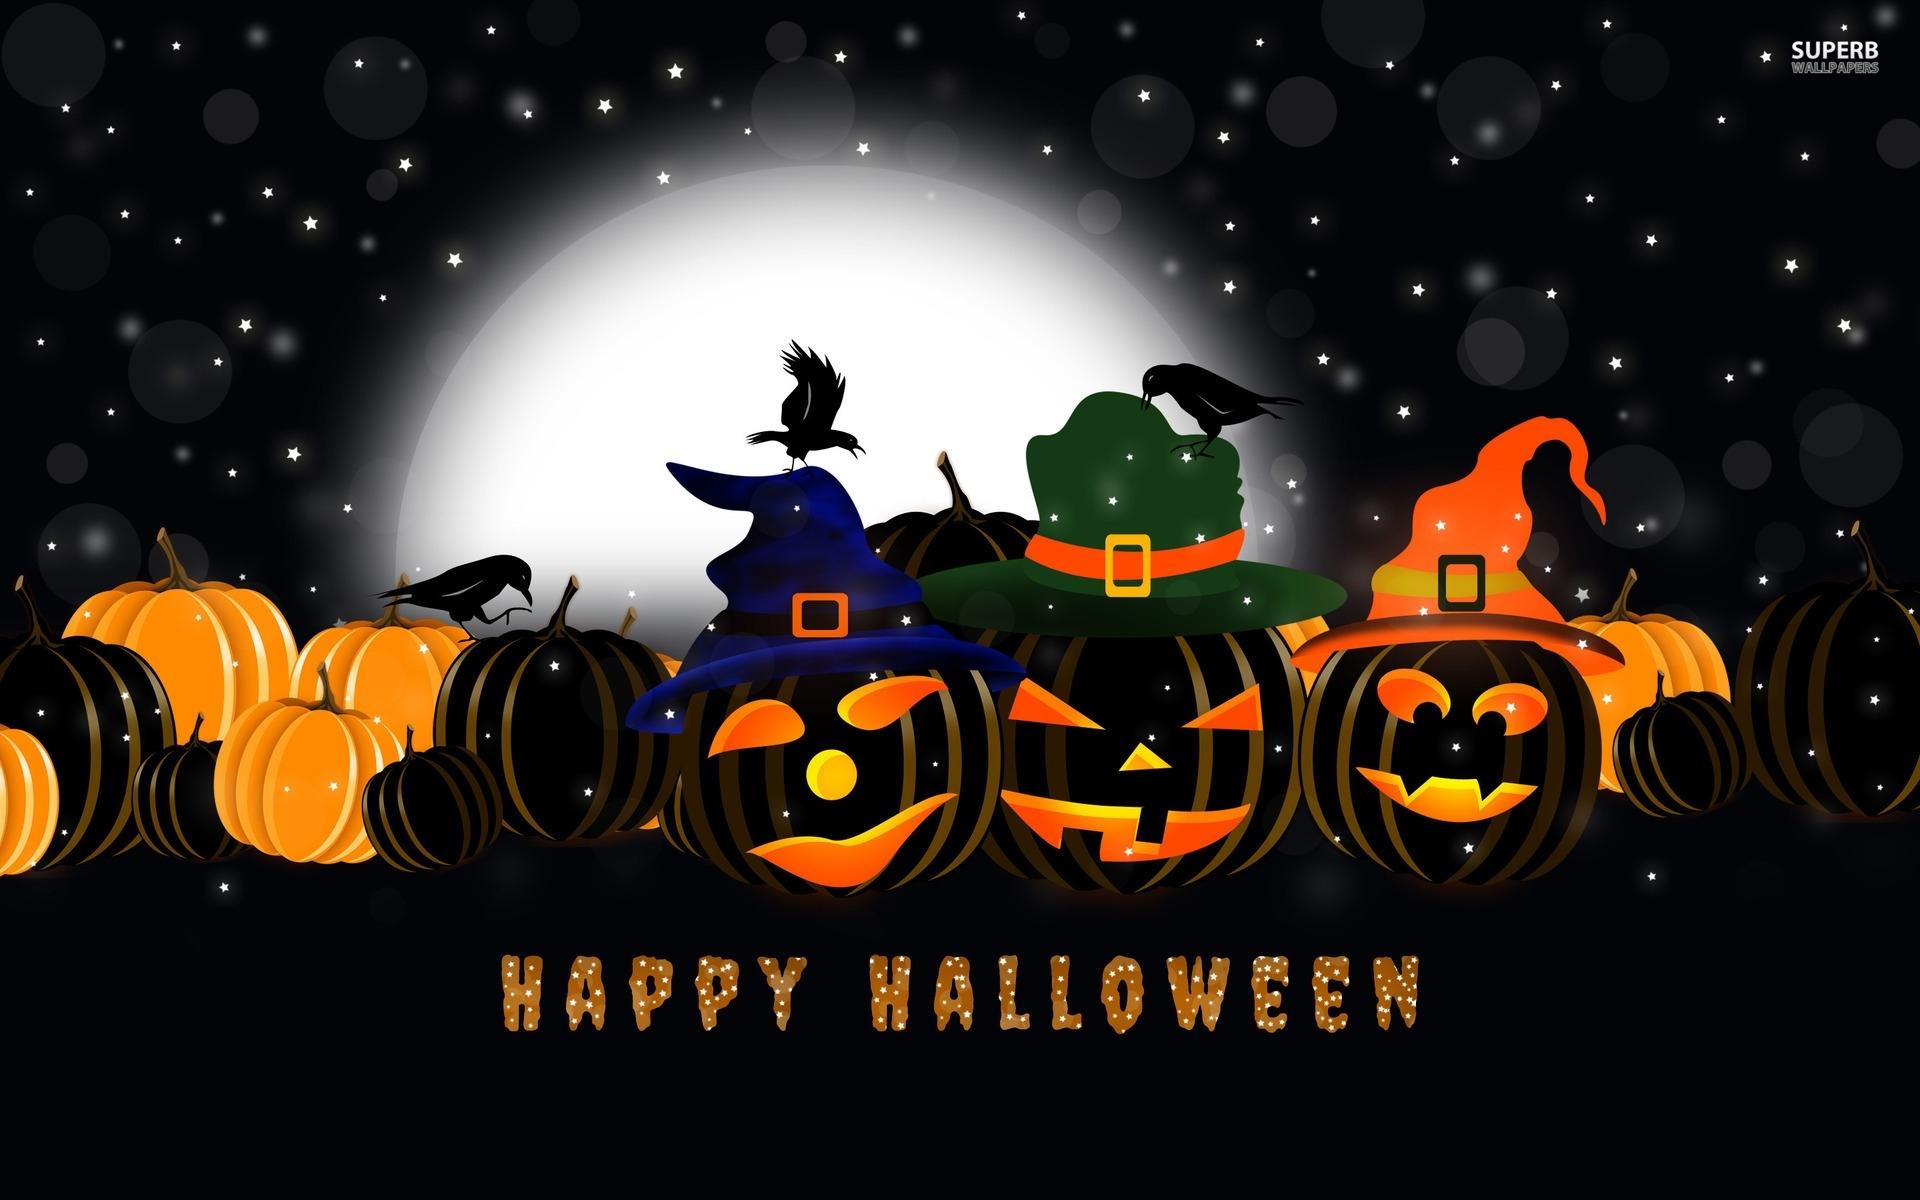 Disney Halloween Desktop Wallpaper Free inceptionwallpaper.com